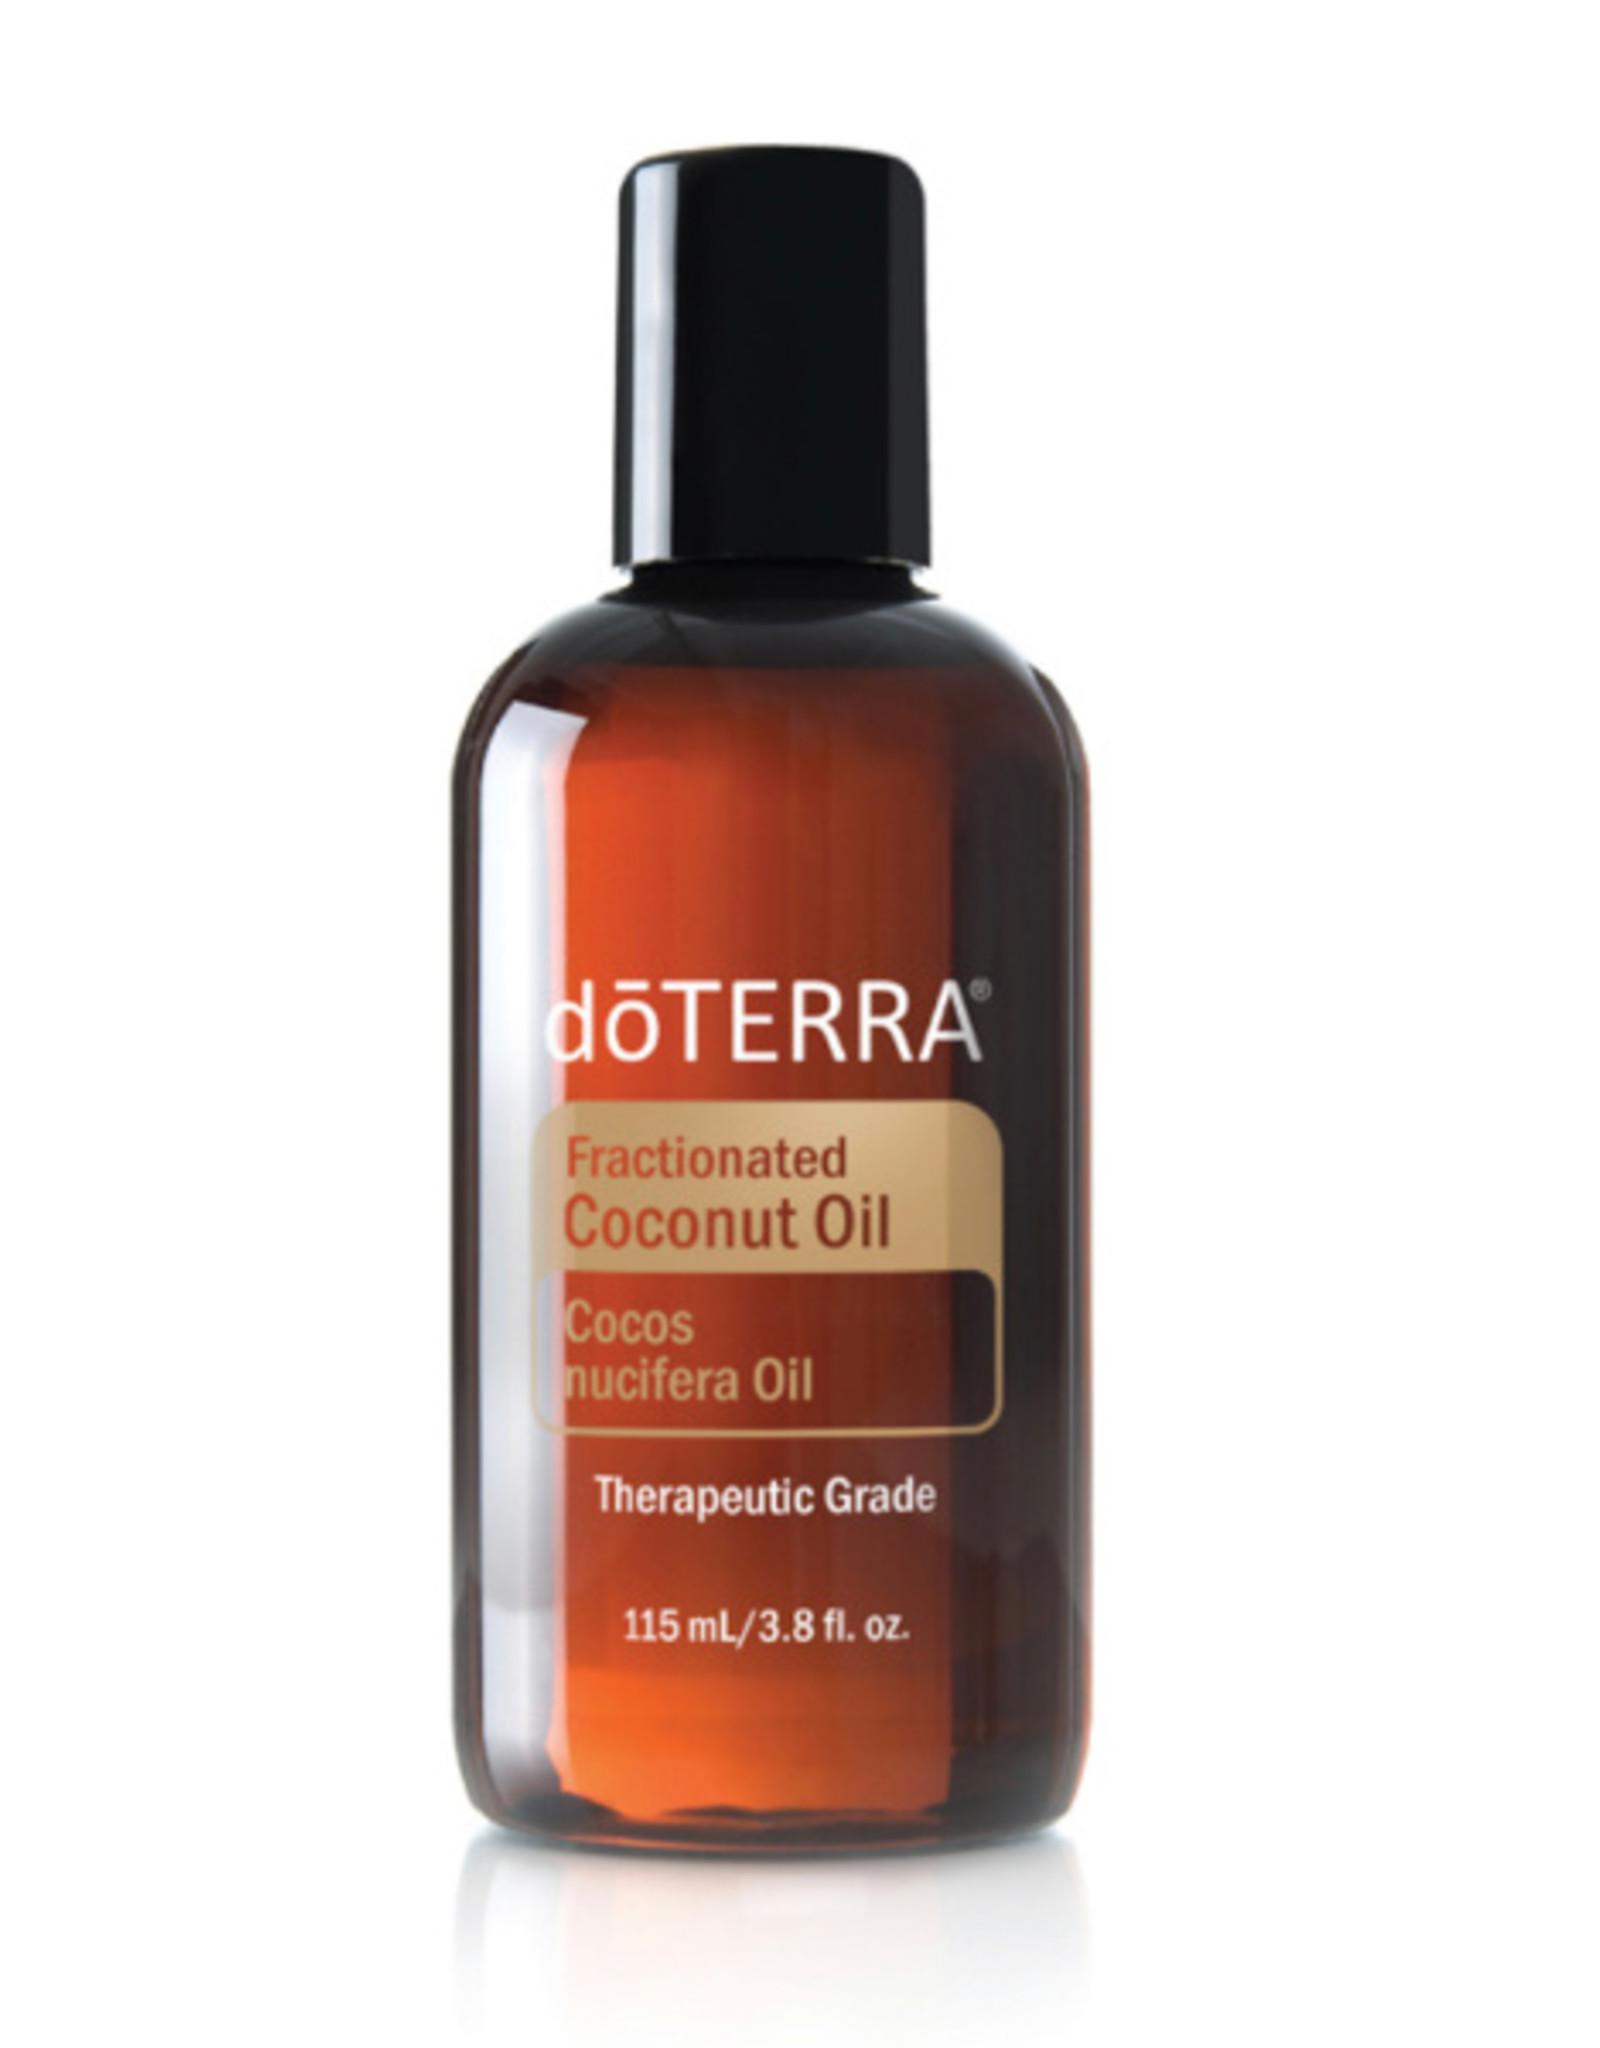 dōTERRA Fractionated Coconut Oil